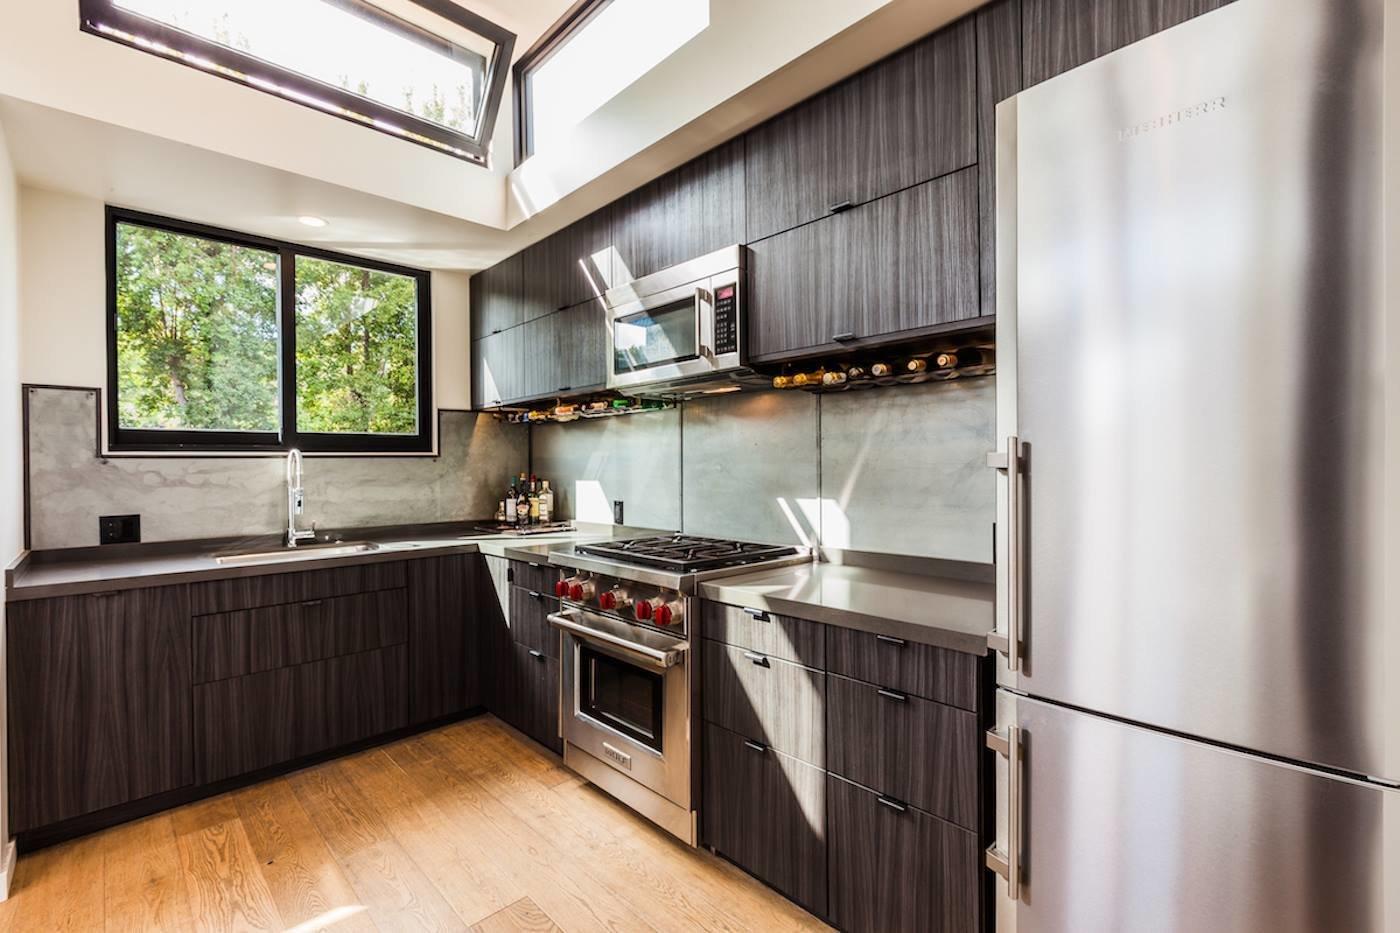 Kitchen, Metal Backsplashe, Refrigerator, Quartzite Counter, Light Hardwood Floor, Range, Dishwasher, Microwave, Undermount Sink, and Ceiling Lighting Clean Custom Kitchen  Reclaimed Malibu Modern Beach Retreat